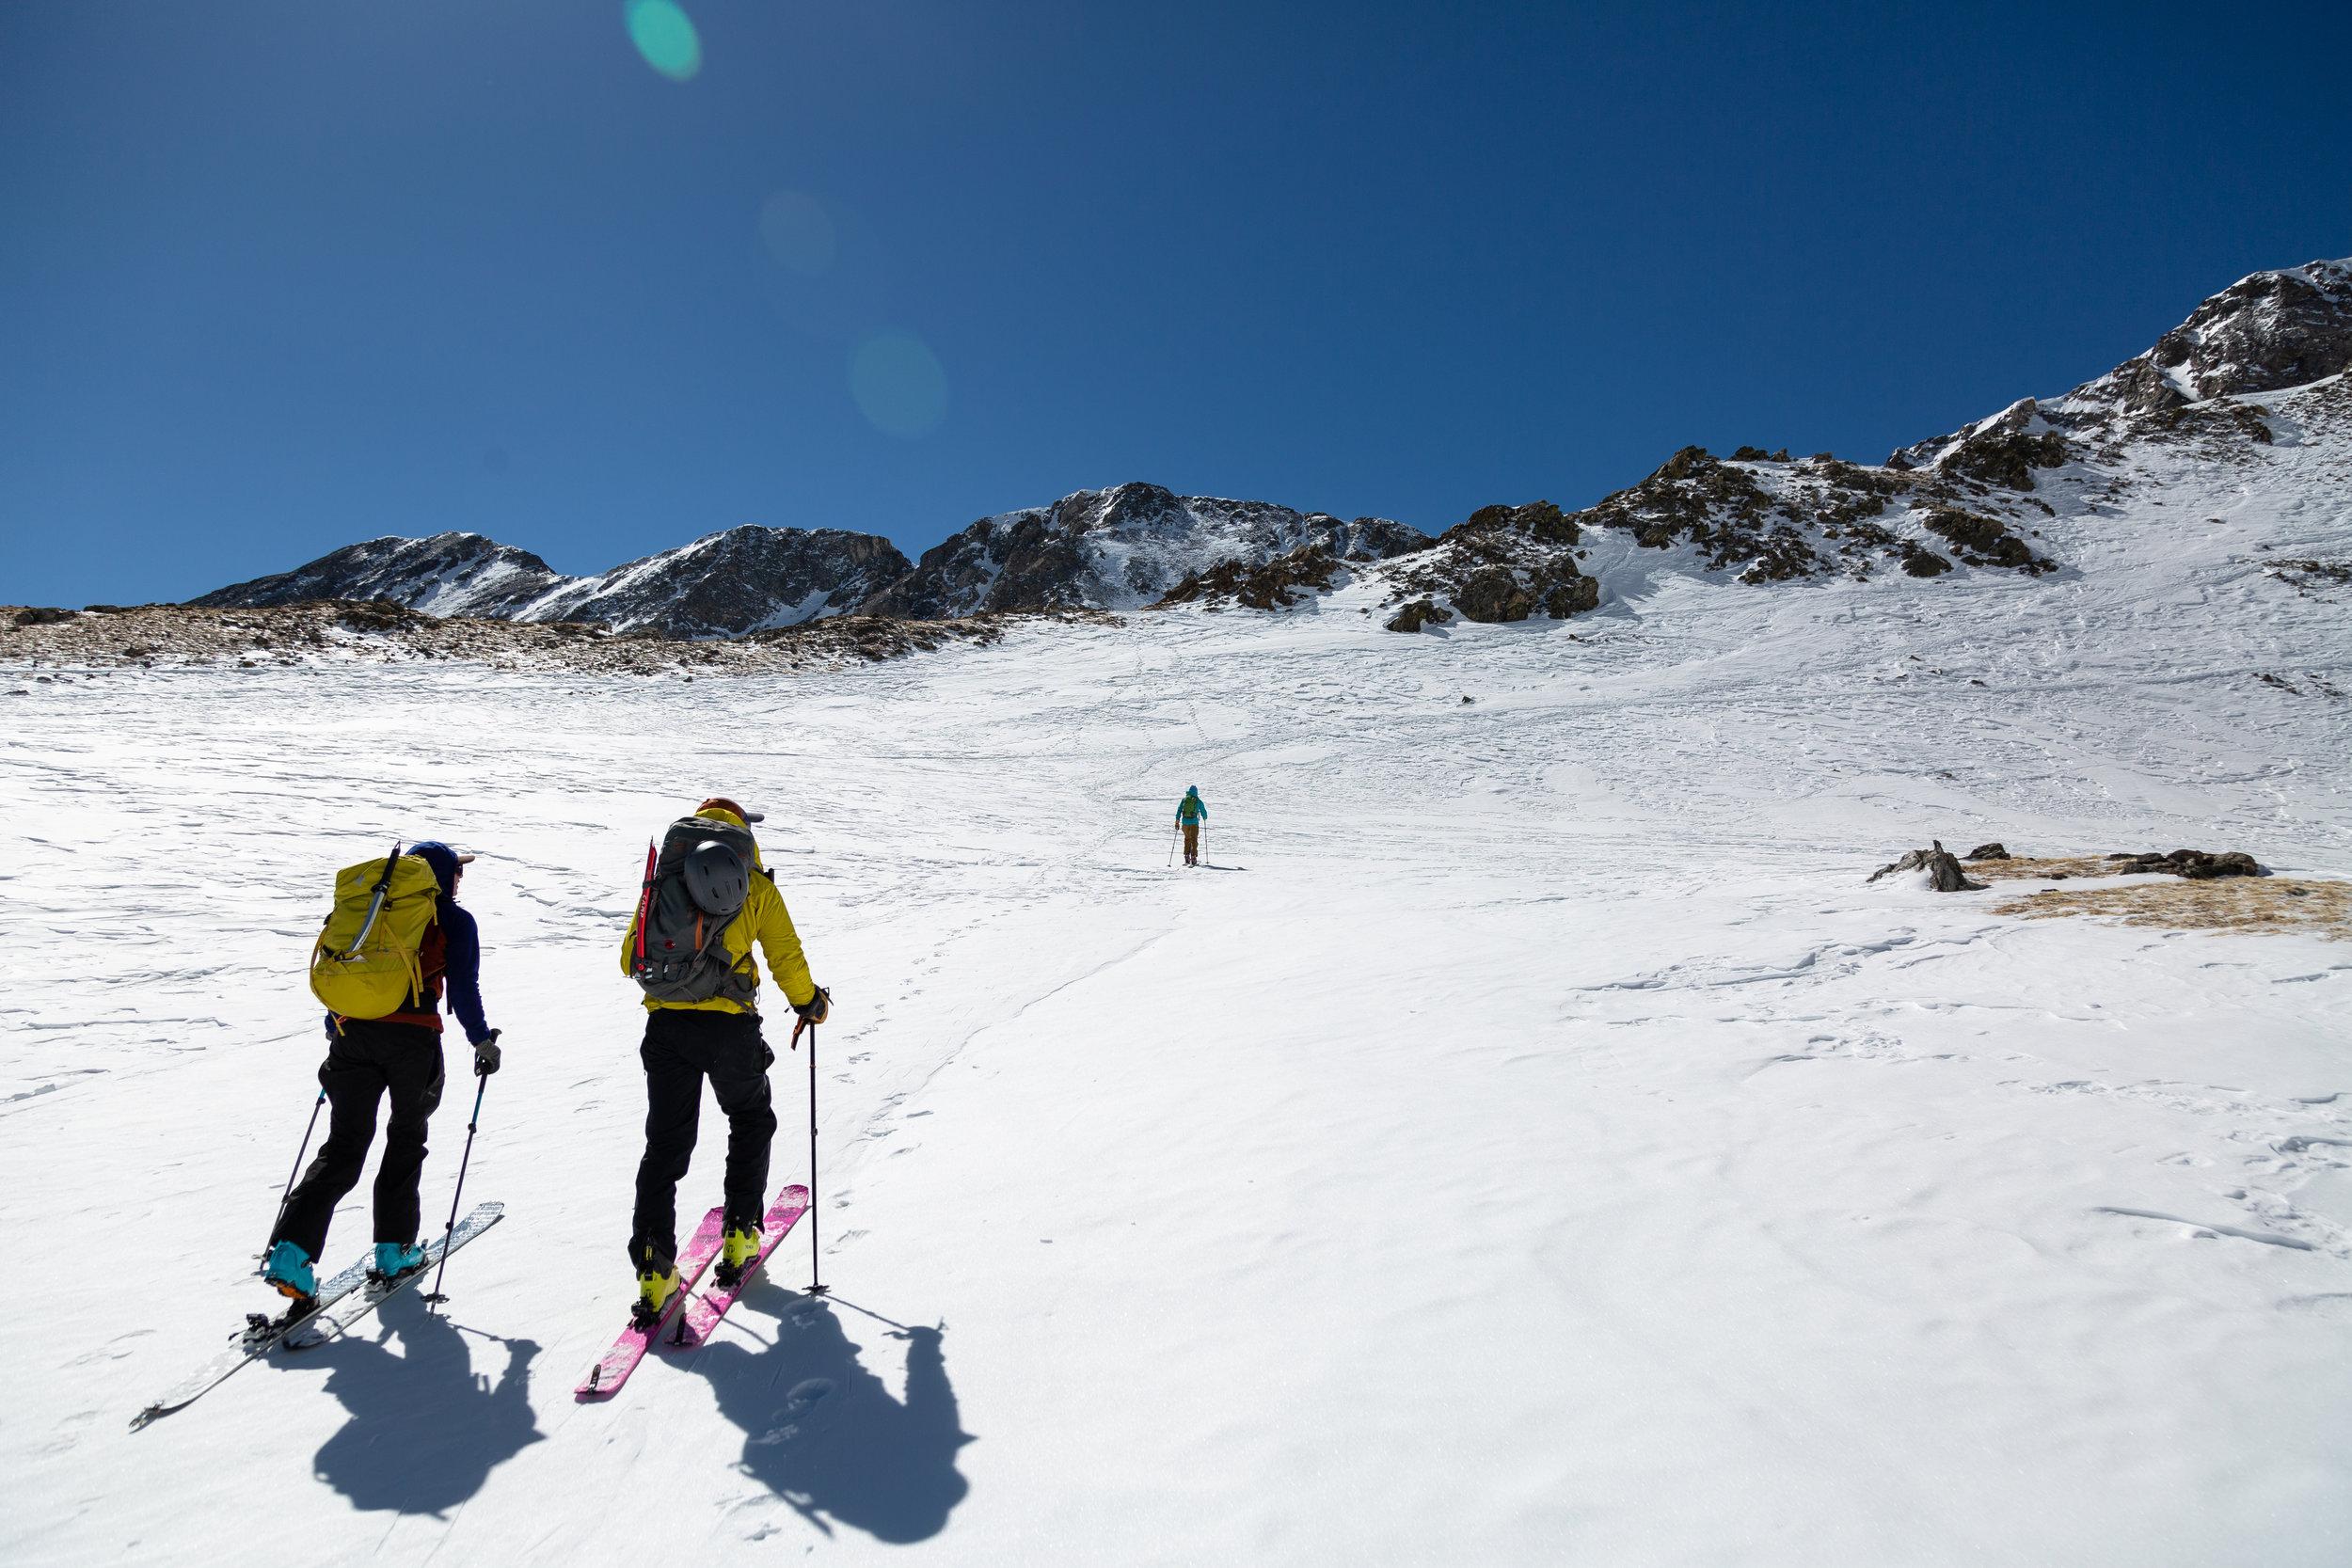 JTG_Skiing-4.jpg